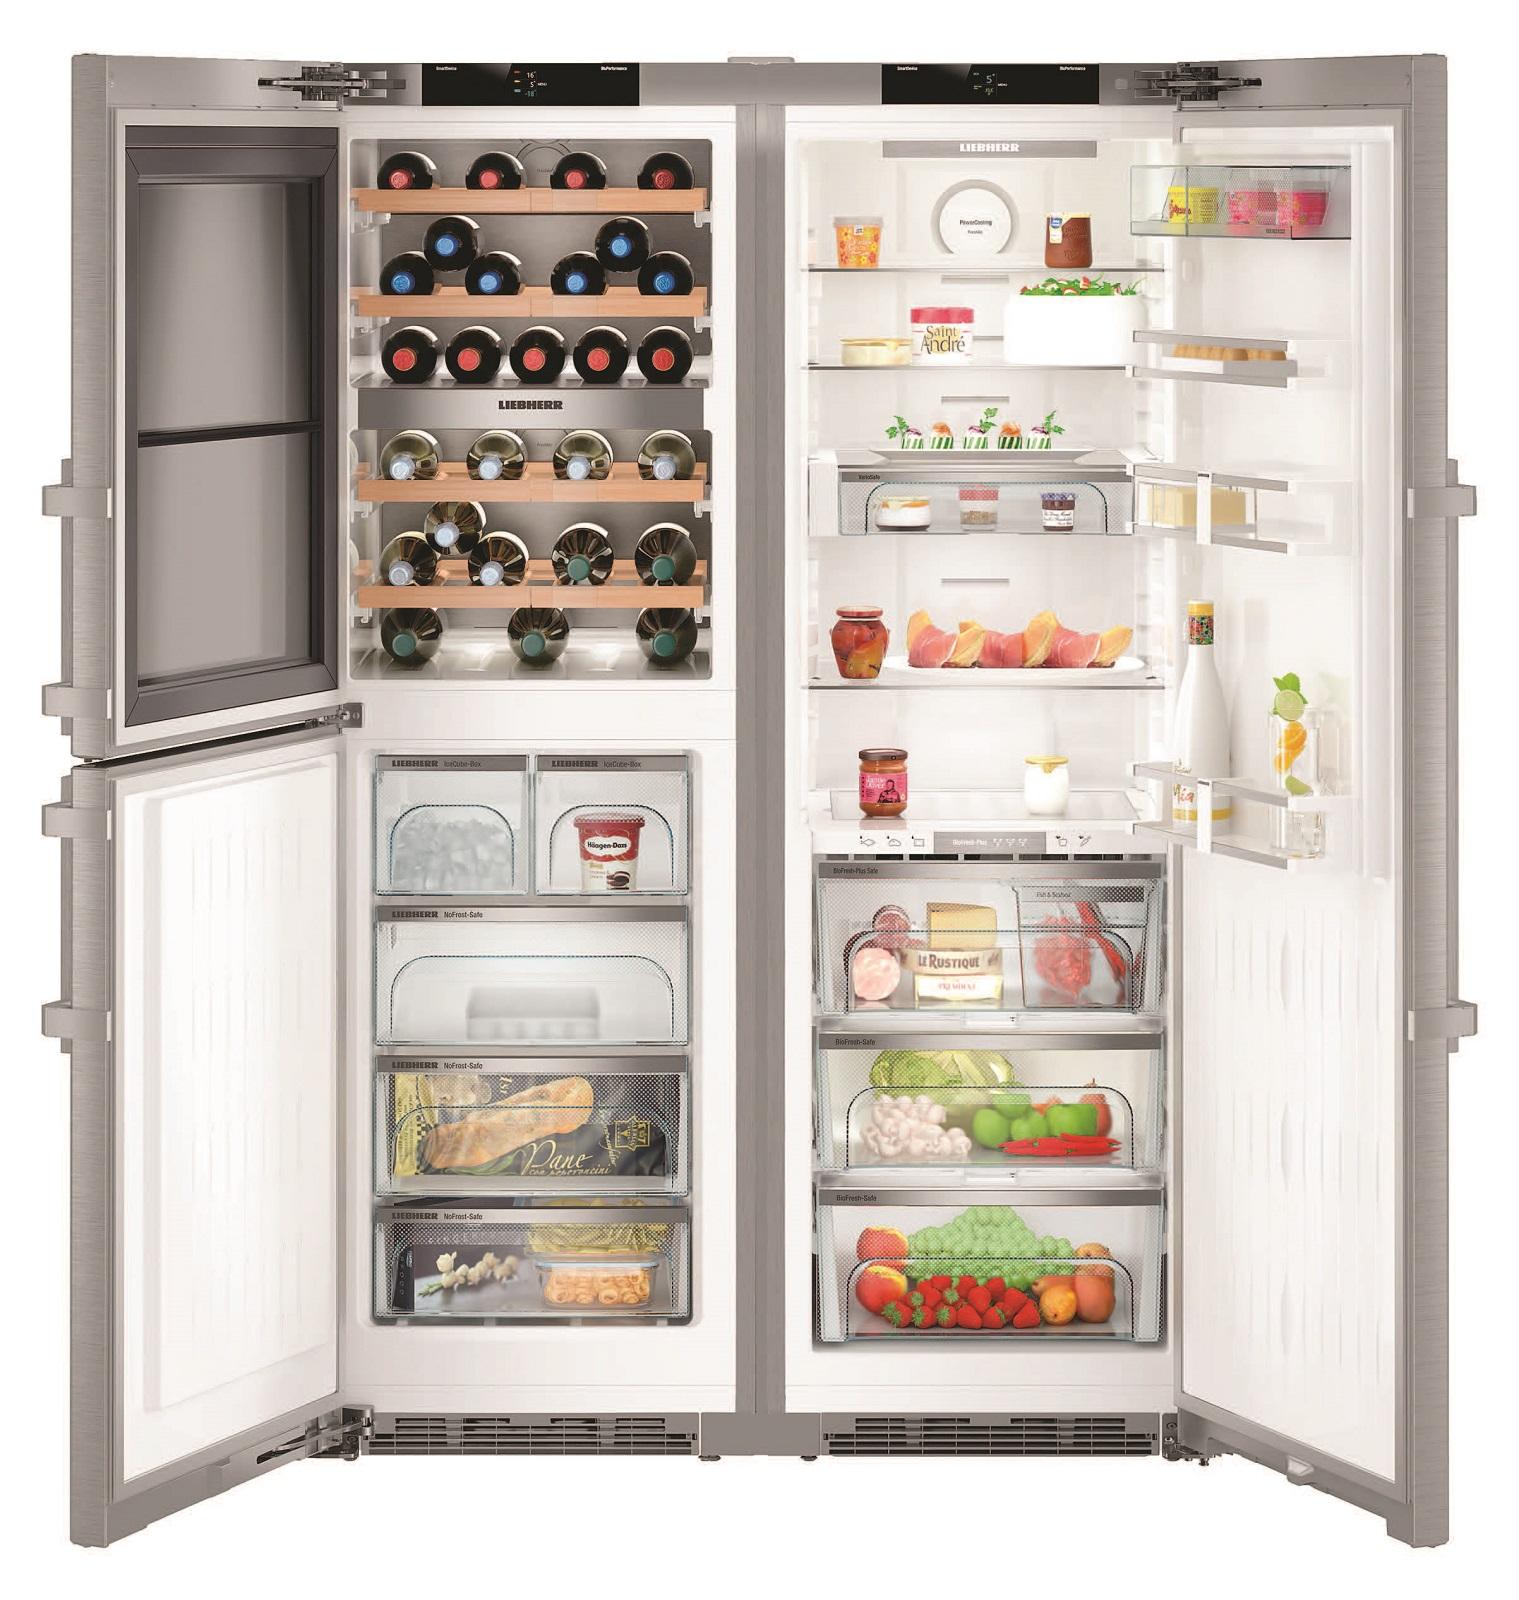 Side-by-Side холодильник Liebherr SBSes 8496 купить украина